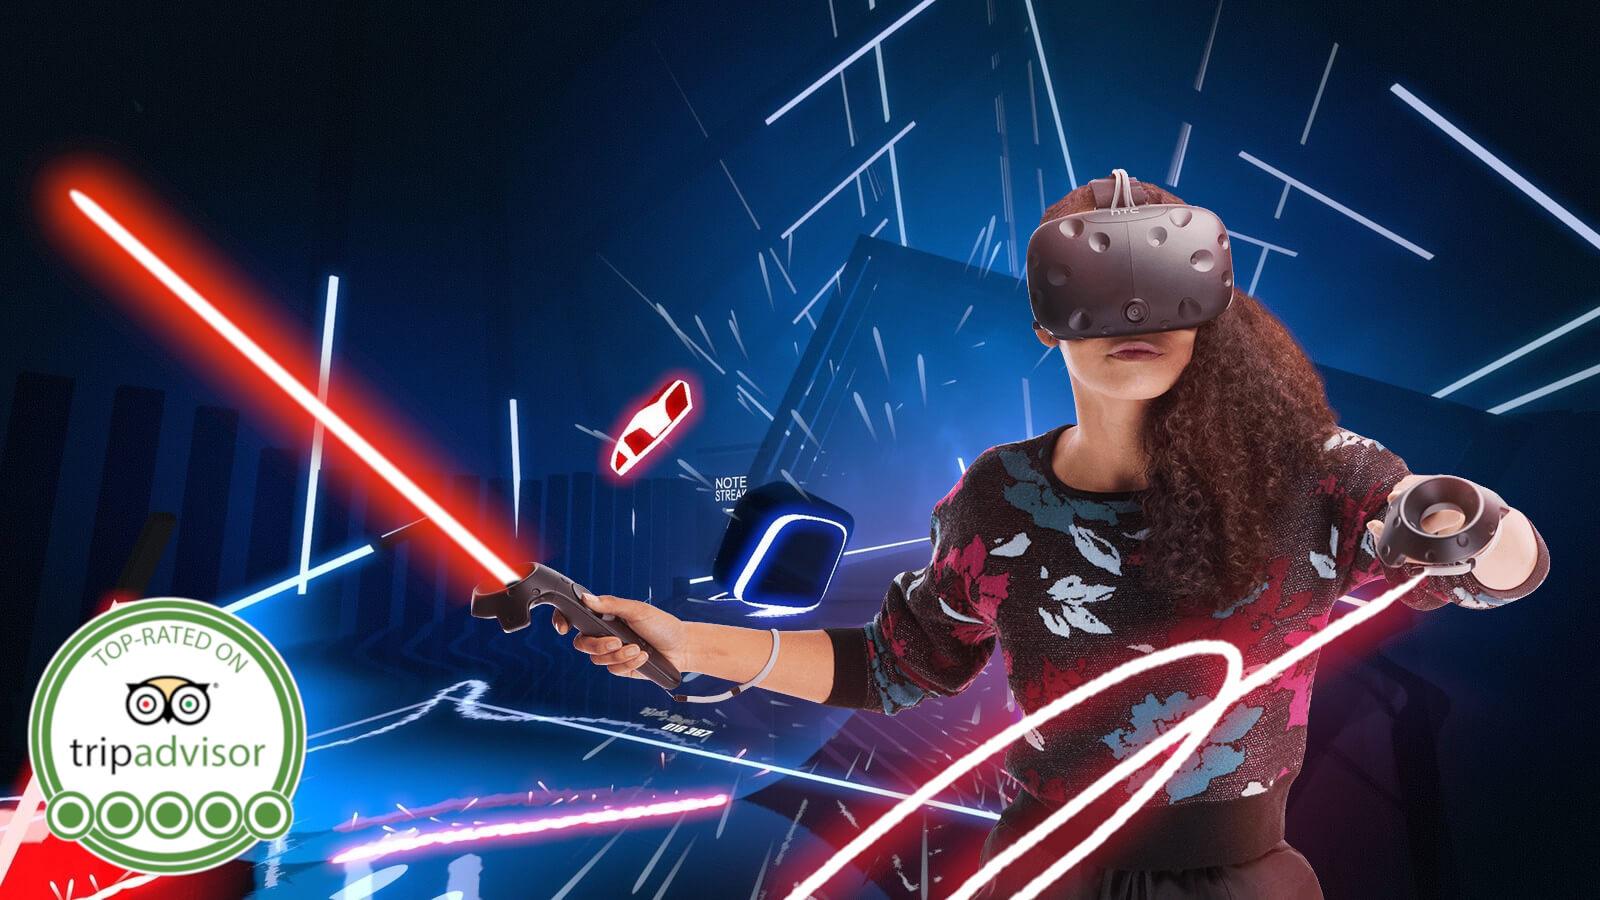 VR Beat Saber Girl